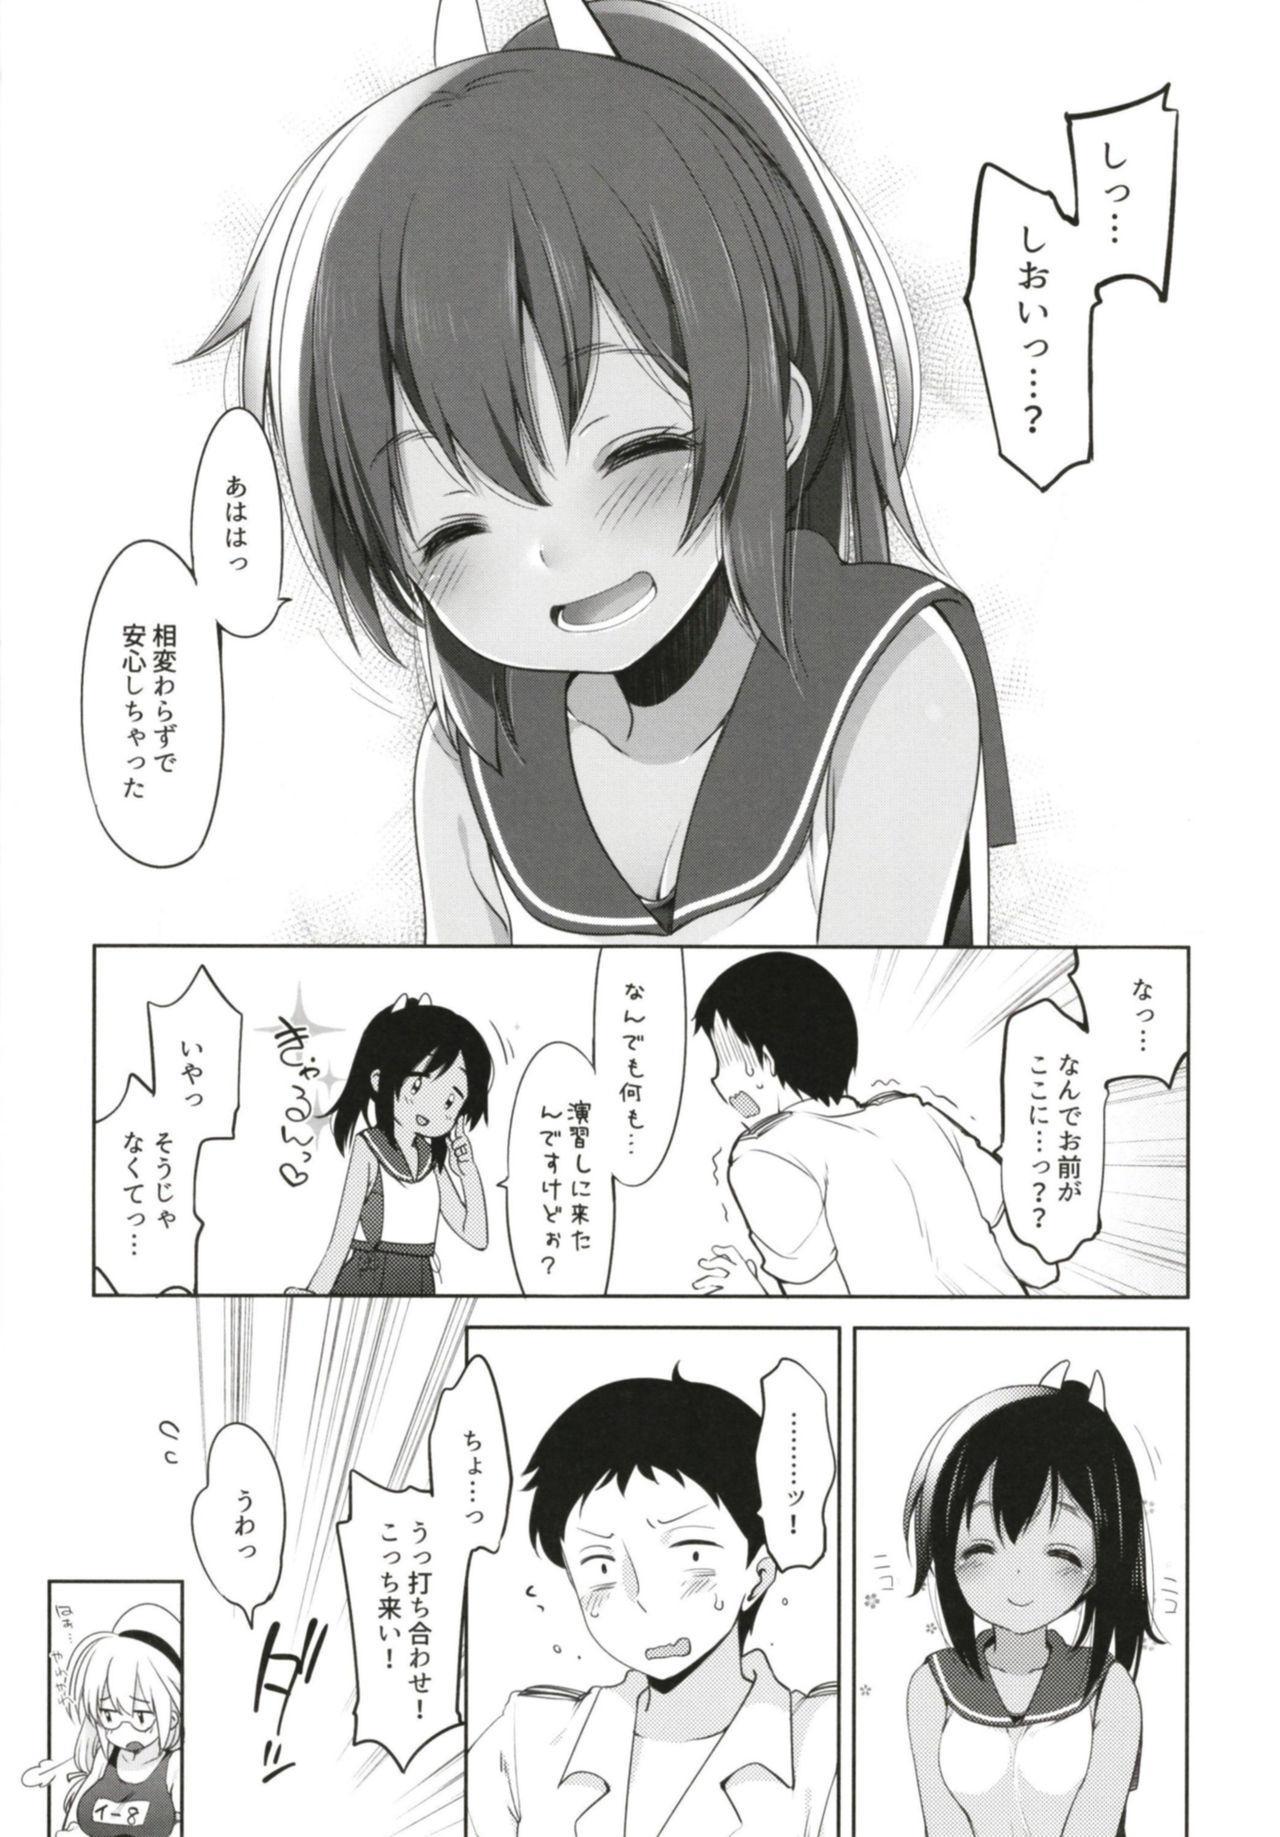 [French letter (Fujisaki Hikari)] Hitonatsu no Ayamachi -I-401 Soushuuhen- (Kantai Collection -KanColle-) [Digital] 36